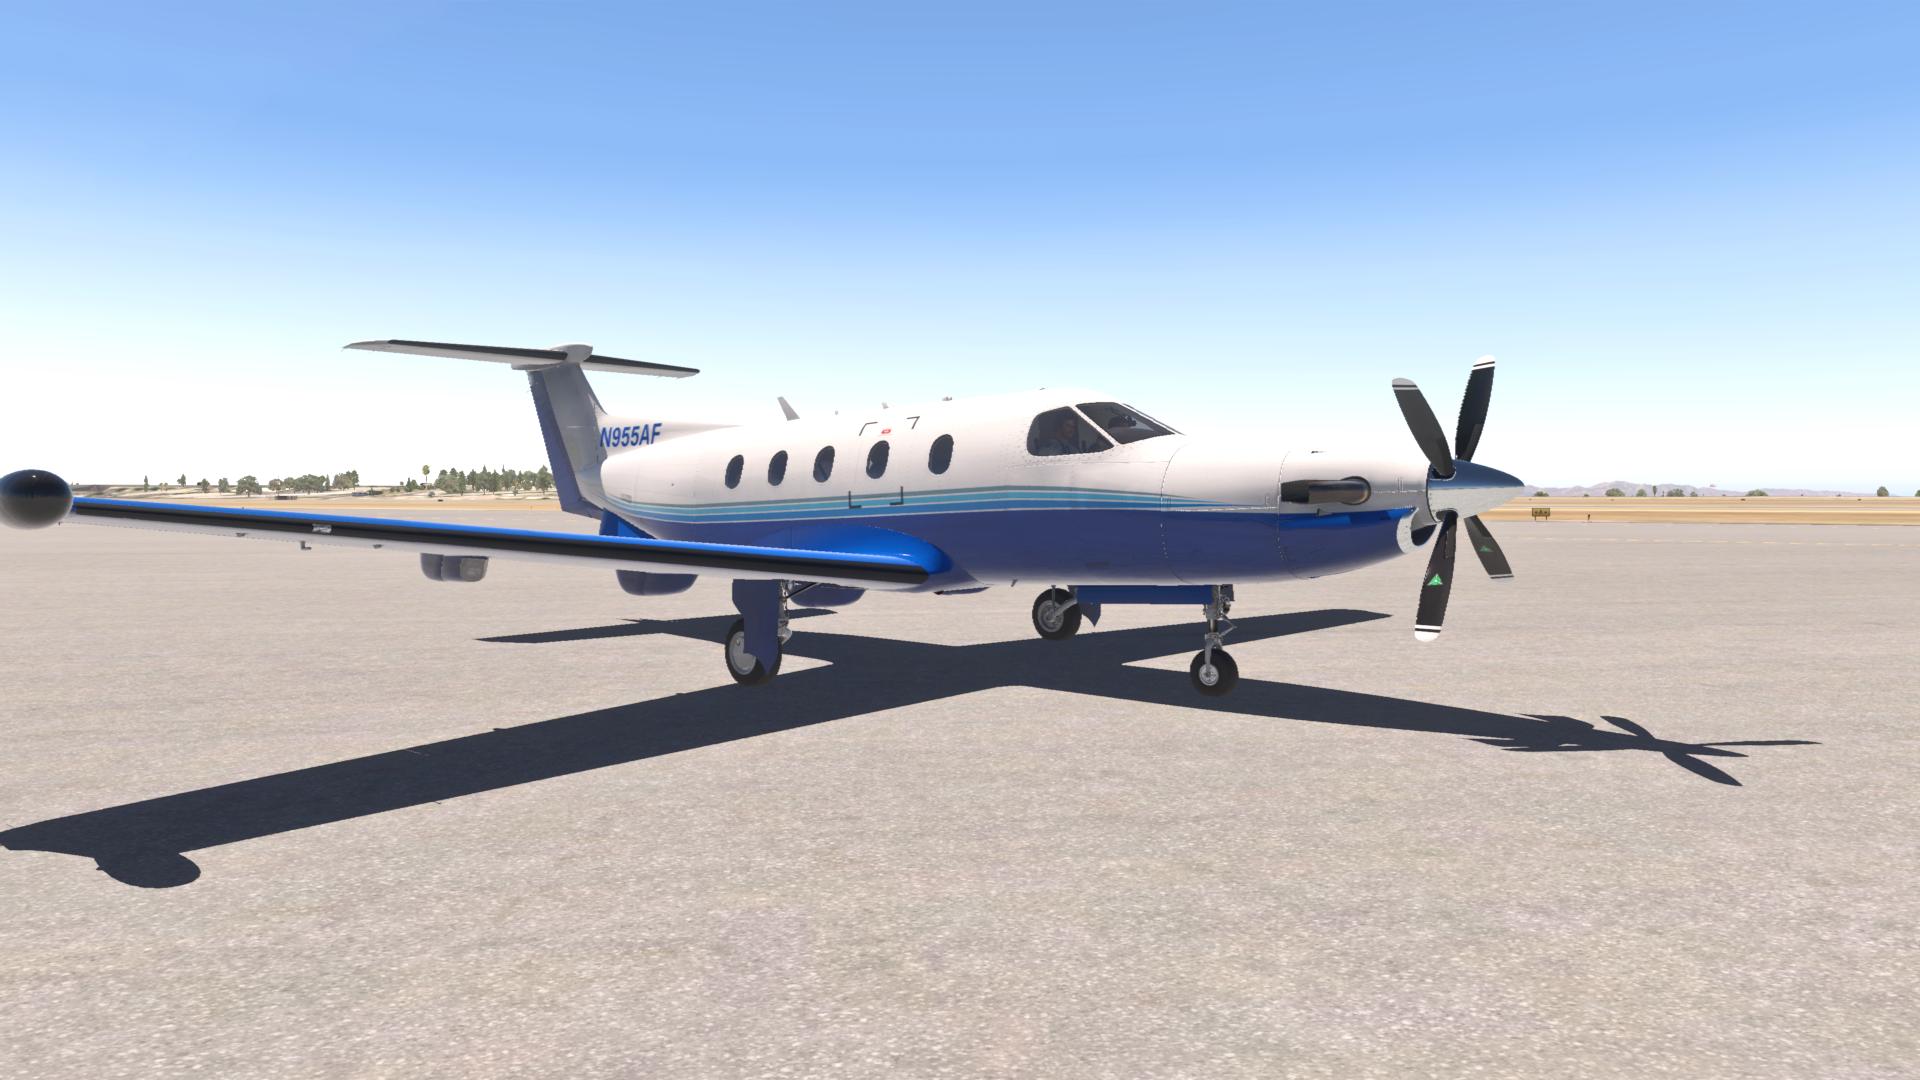 Carenado PC12 PlaneSense livery - Carenado Paints - X-Plane